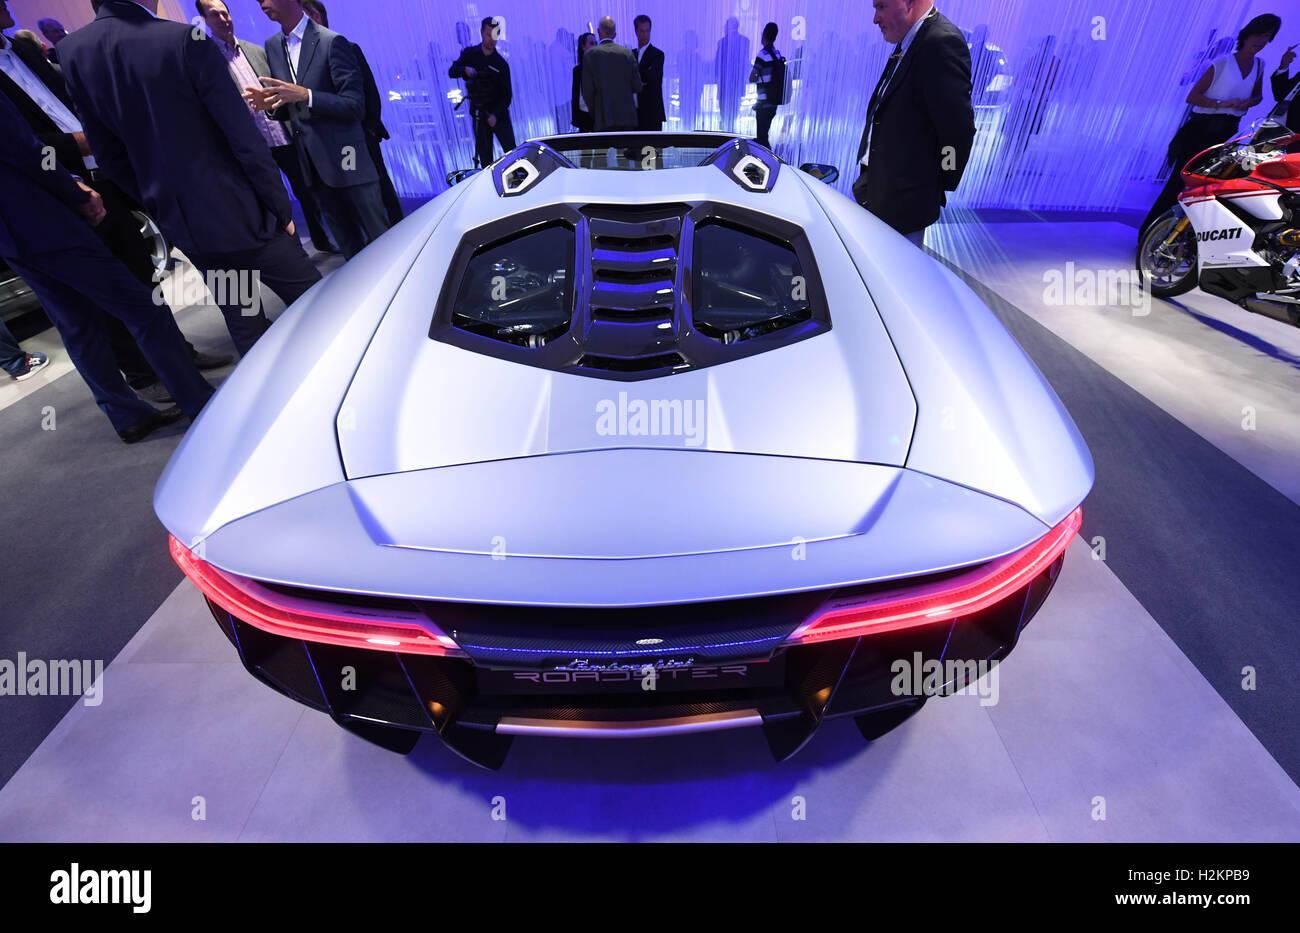 Paris France 28th Sep 2016 The Lamborghini Centenario Roadster